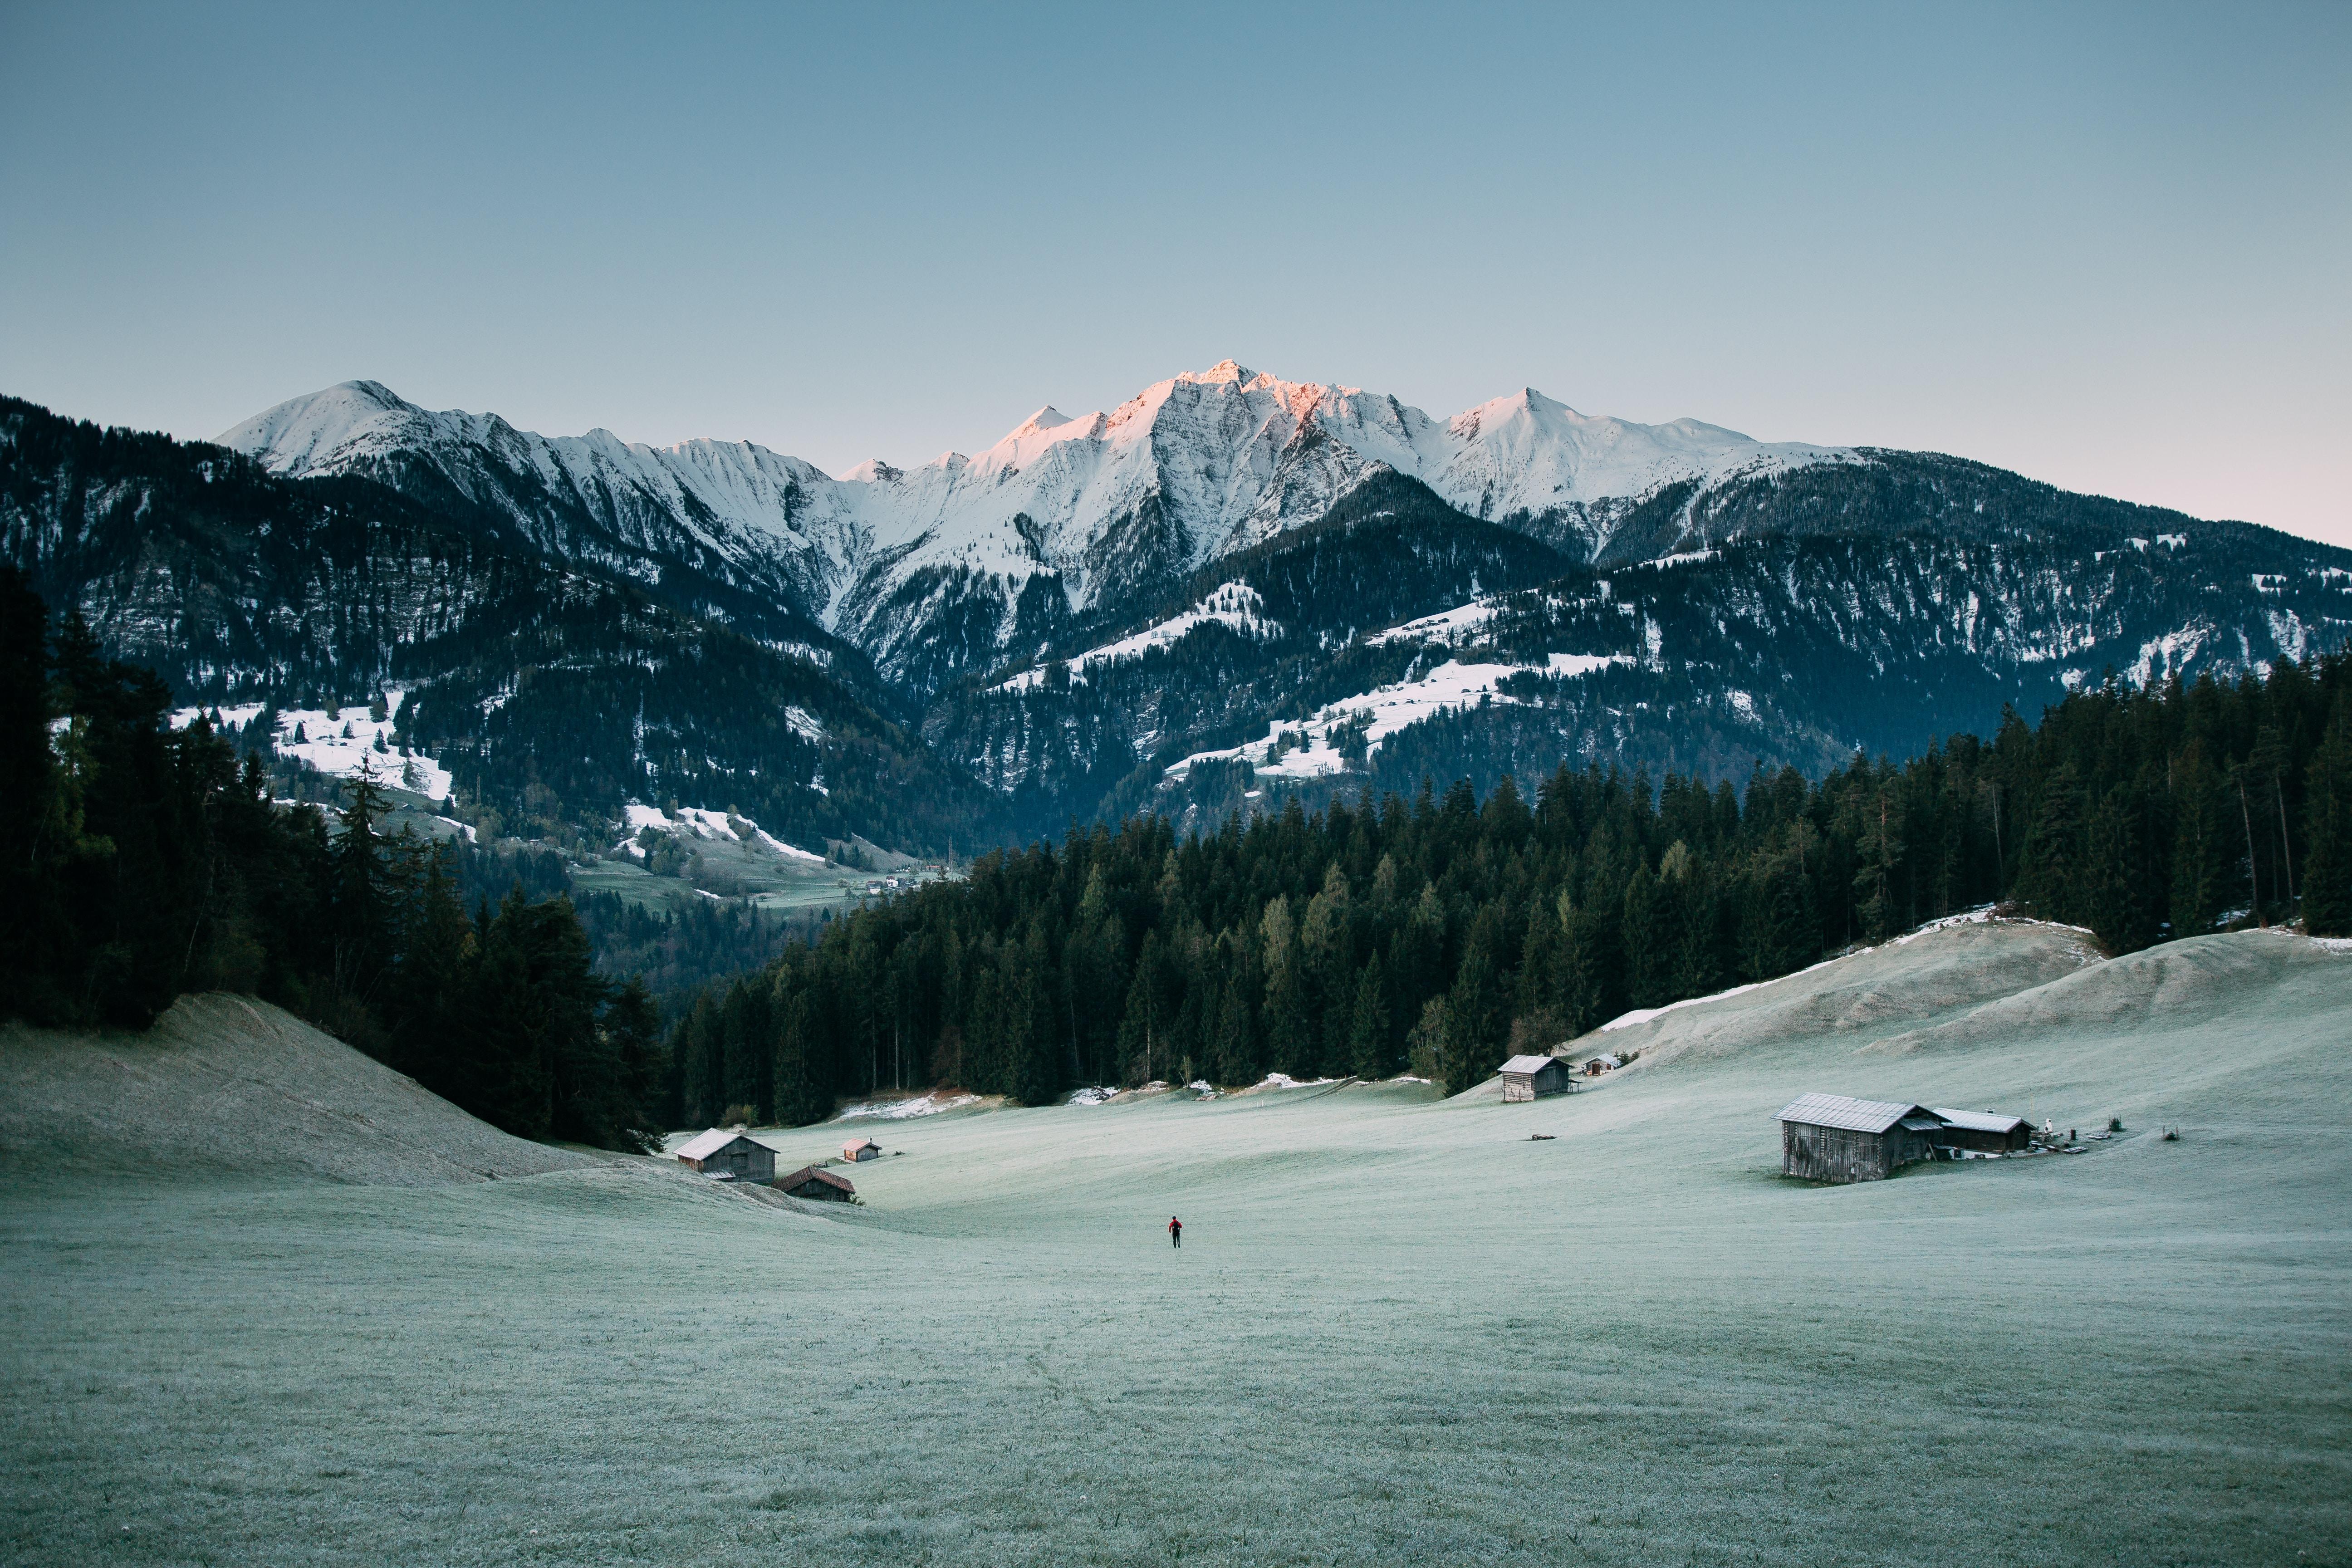 house on snow field beside mountain